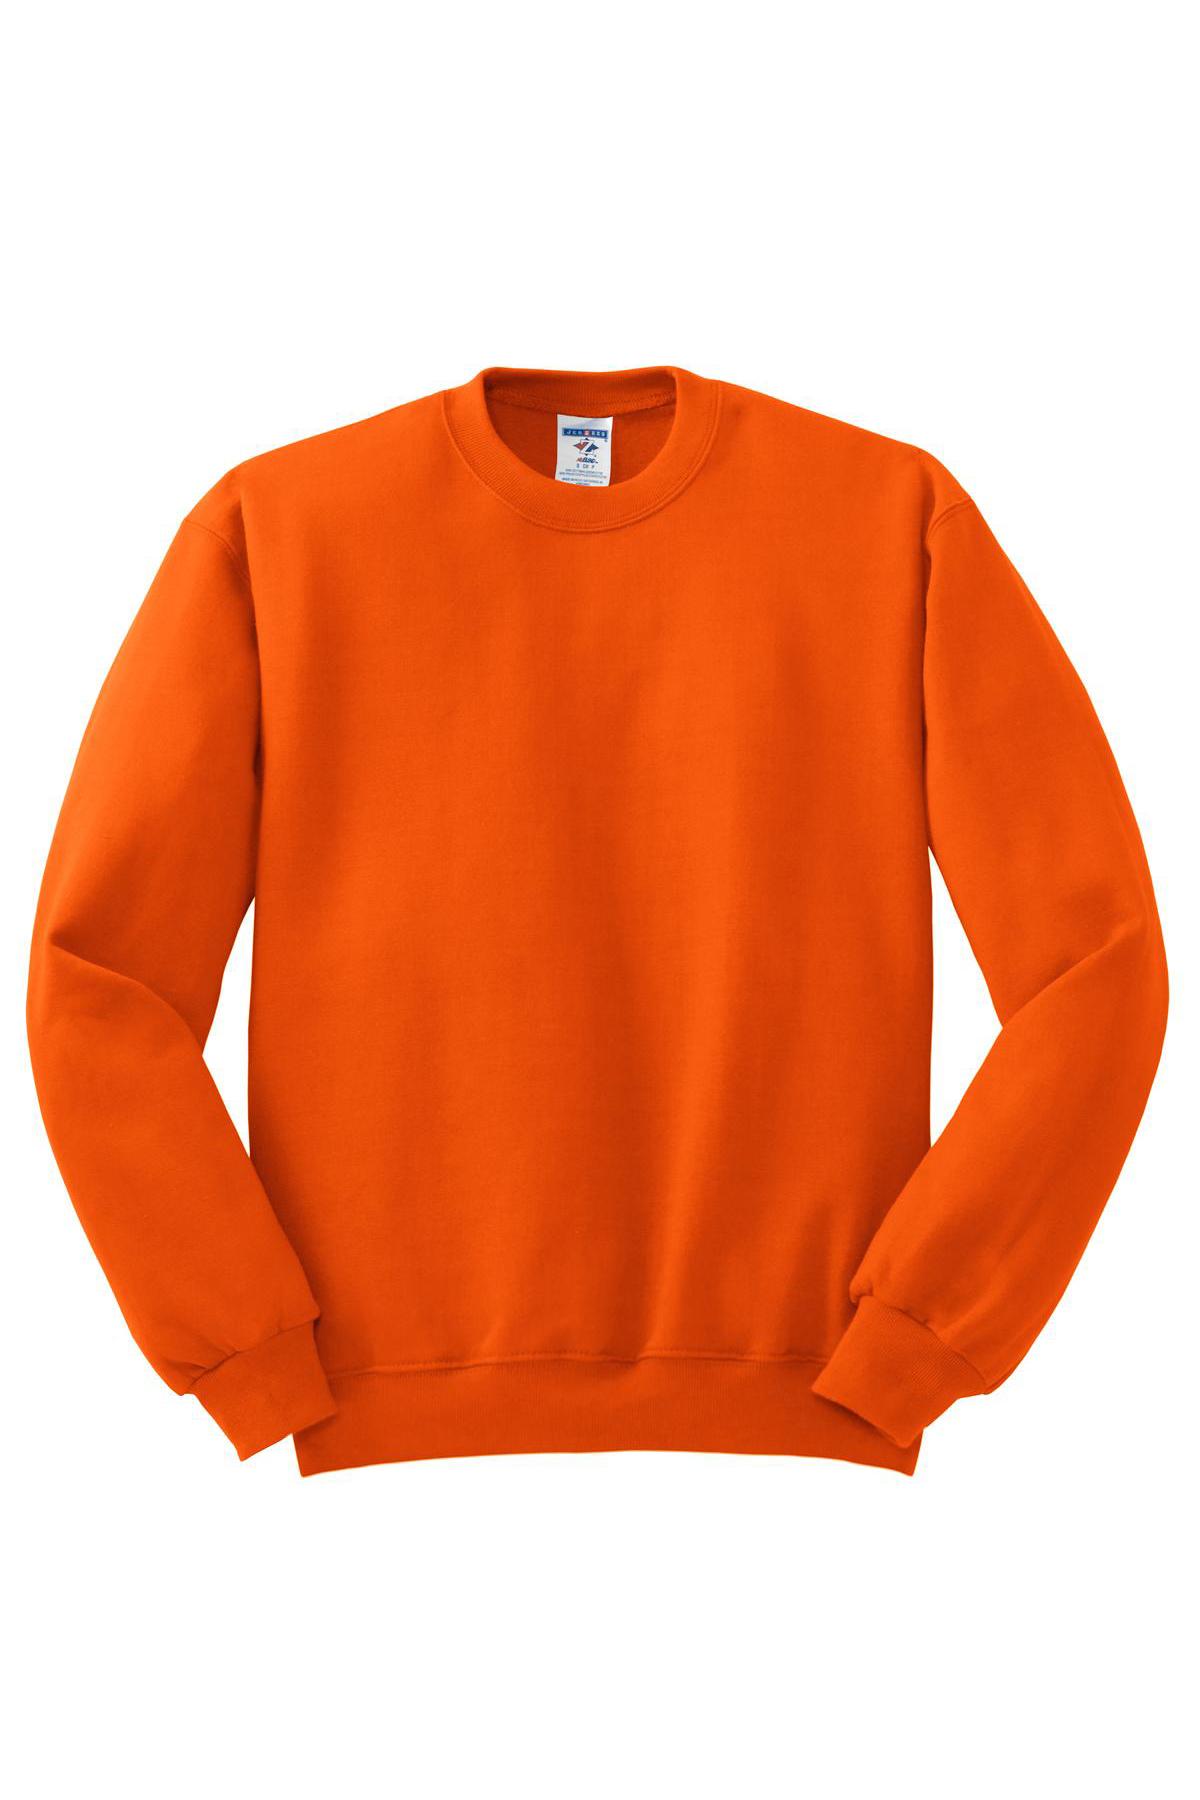 ca2d209e1ae4 JERZEES® - NuBlend® Crewneck Sweatshirt